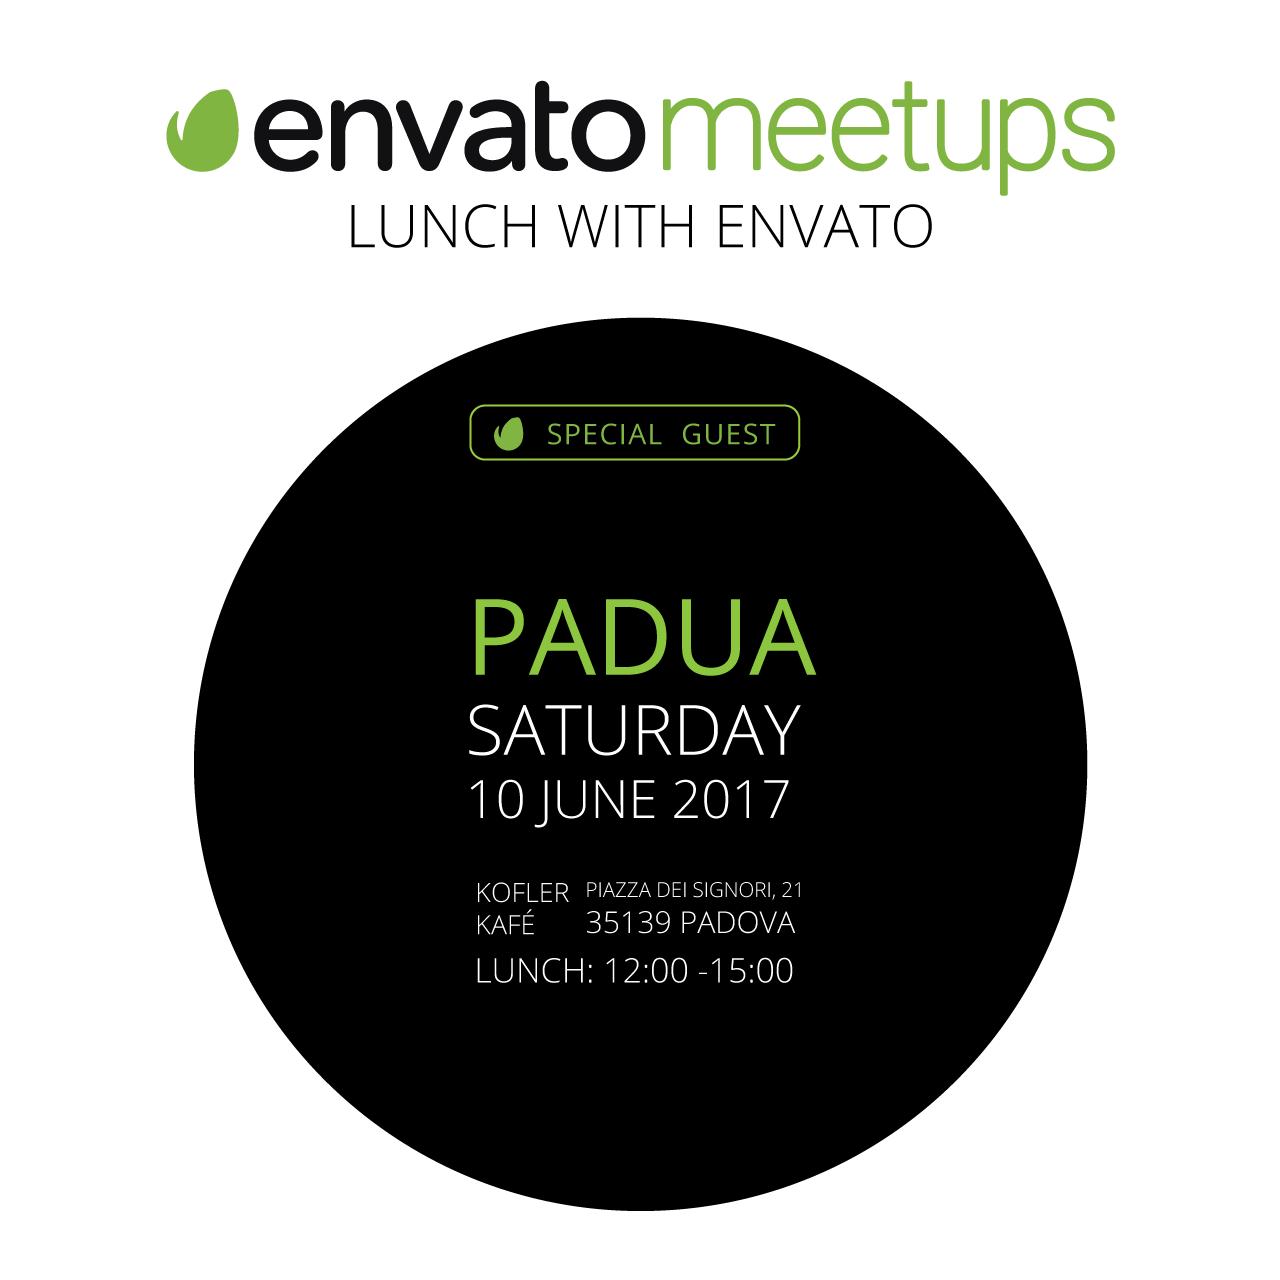 Envato-Meetup-Italy-Padua-2017